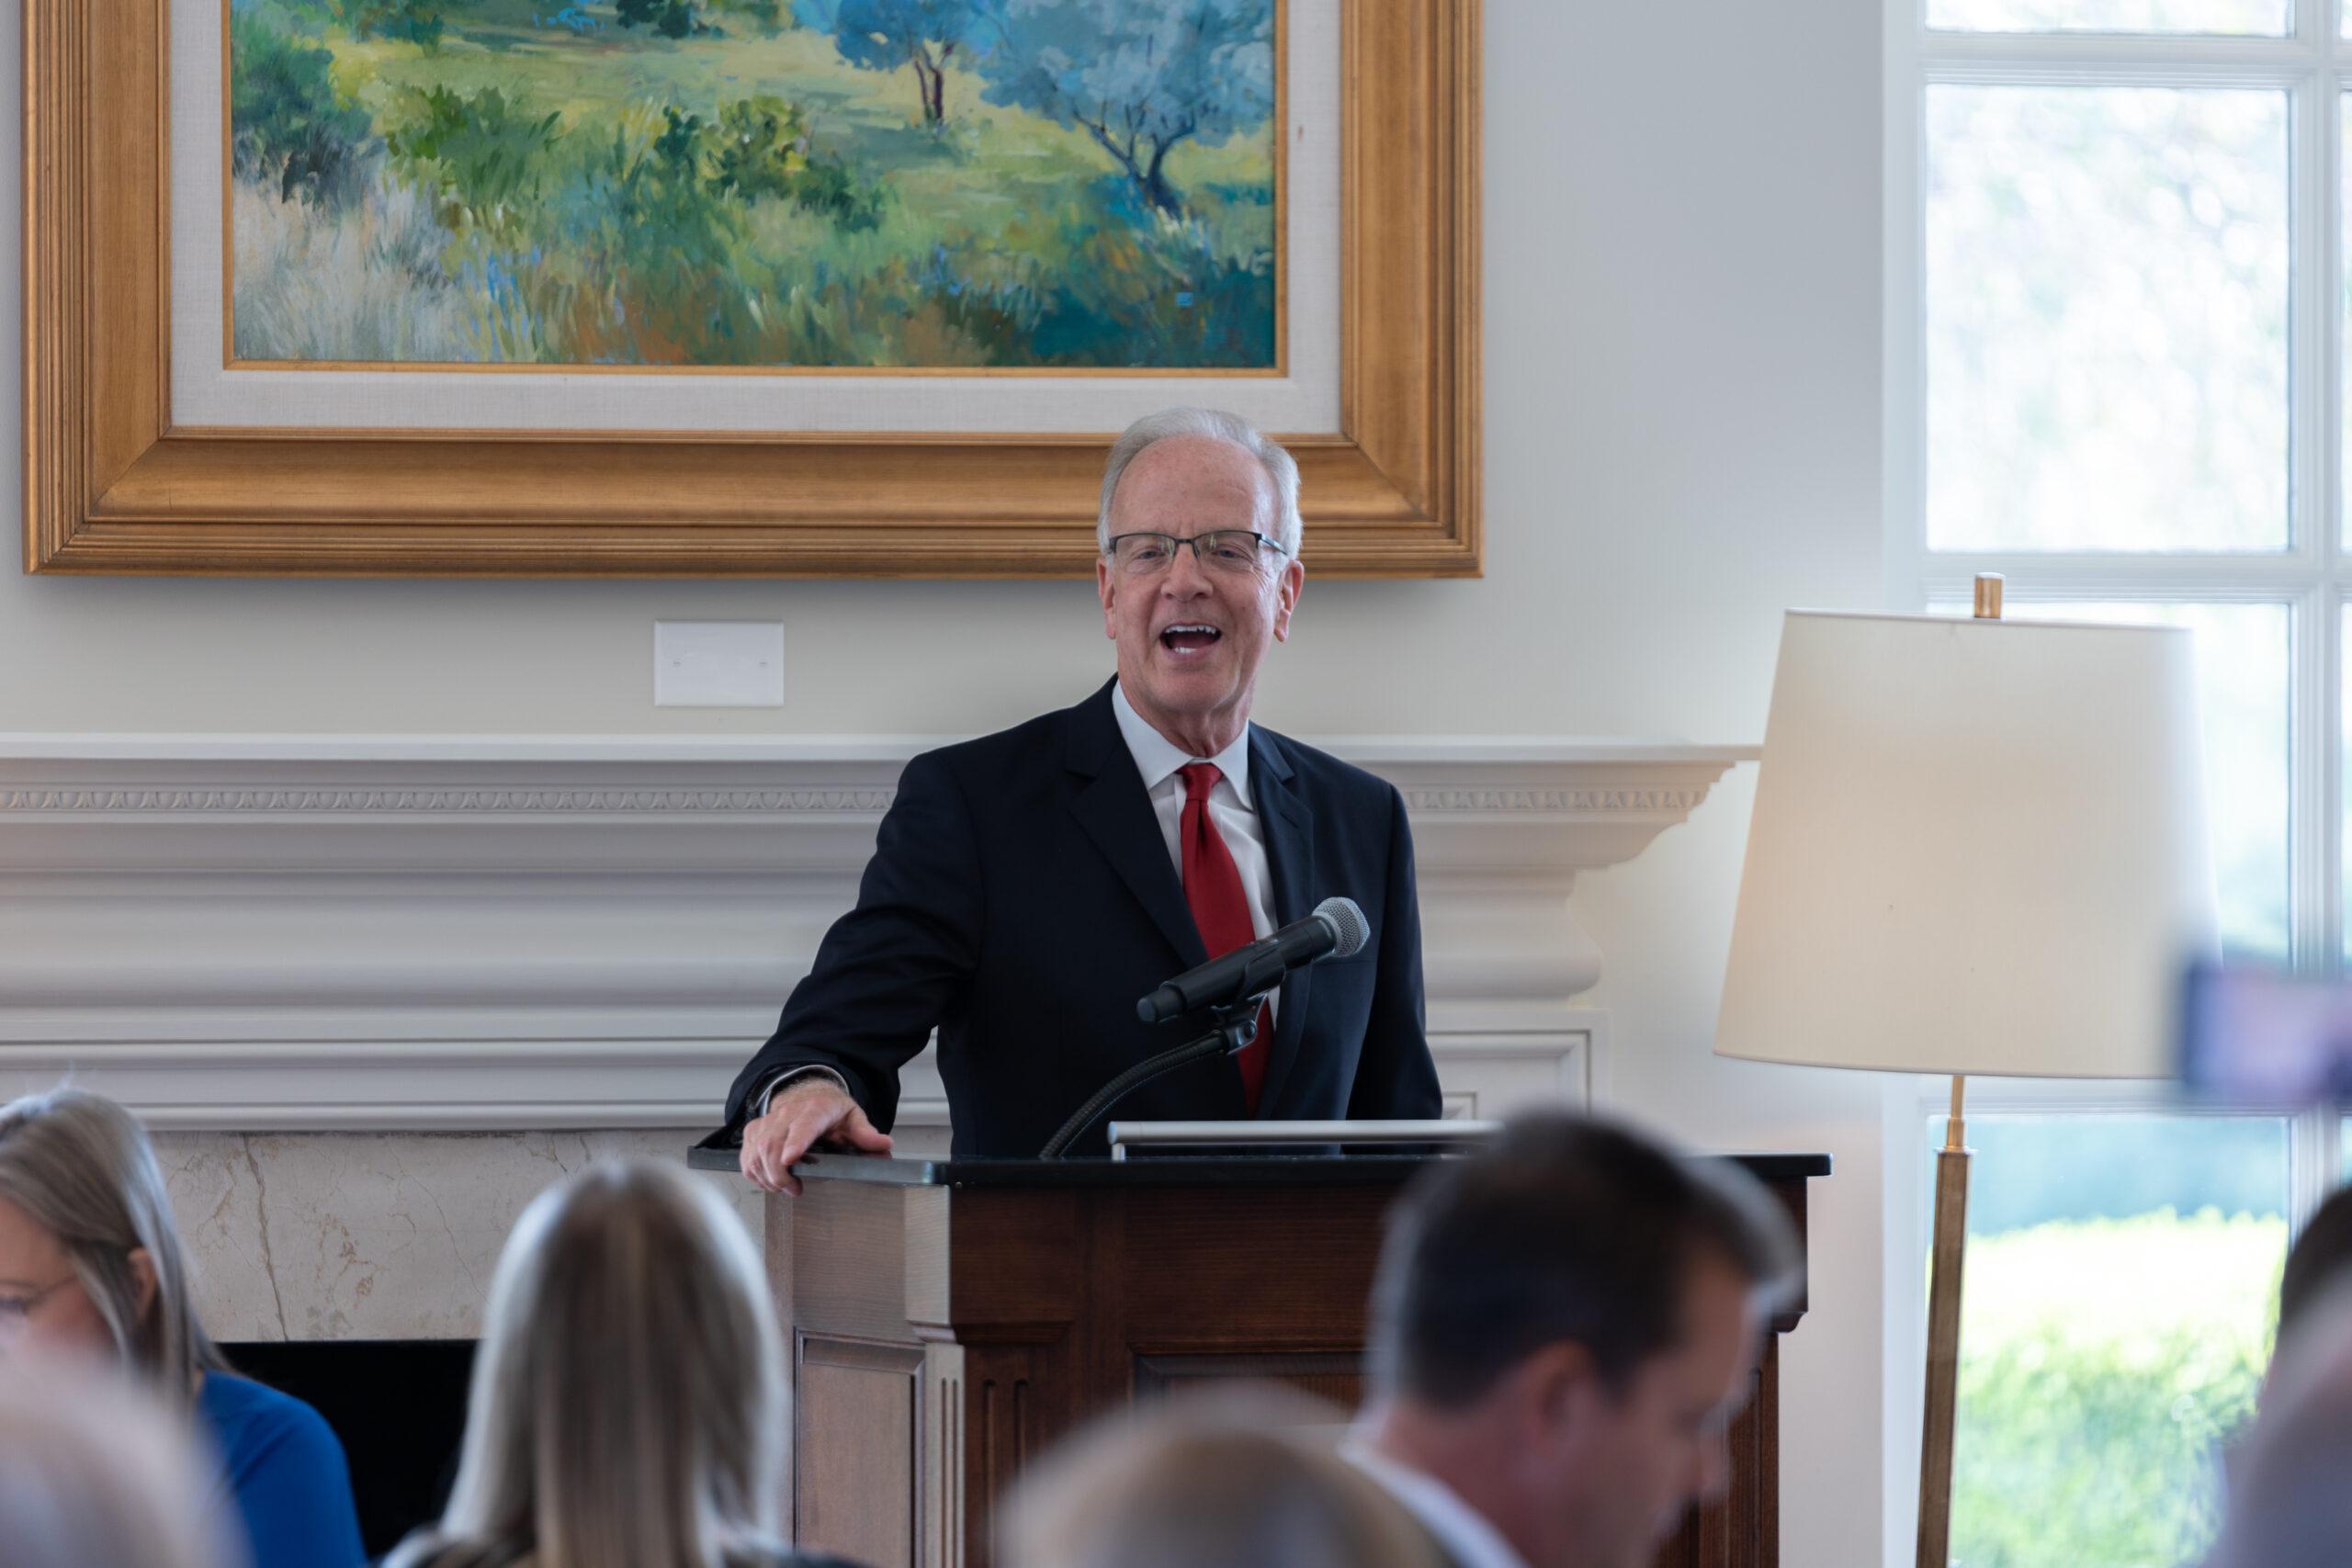 Image description: Senator Jerry Moran speaks at a podium to a room of Kansas City REALTORS.